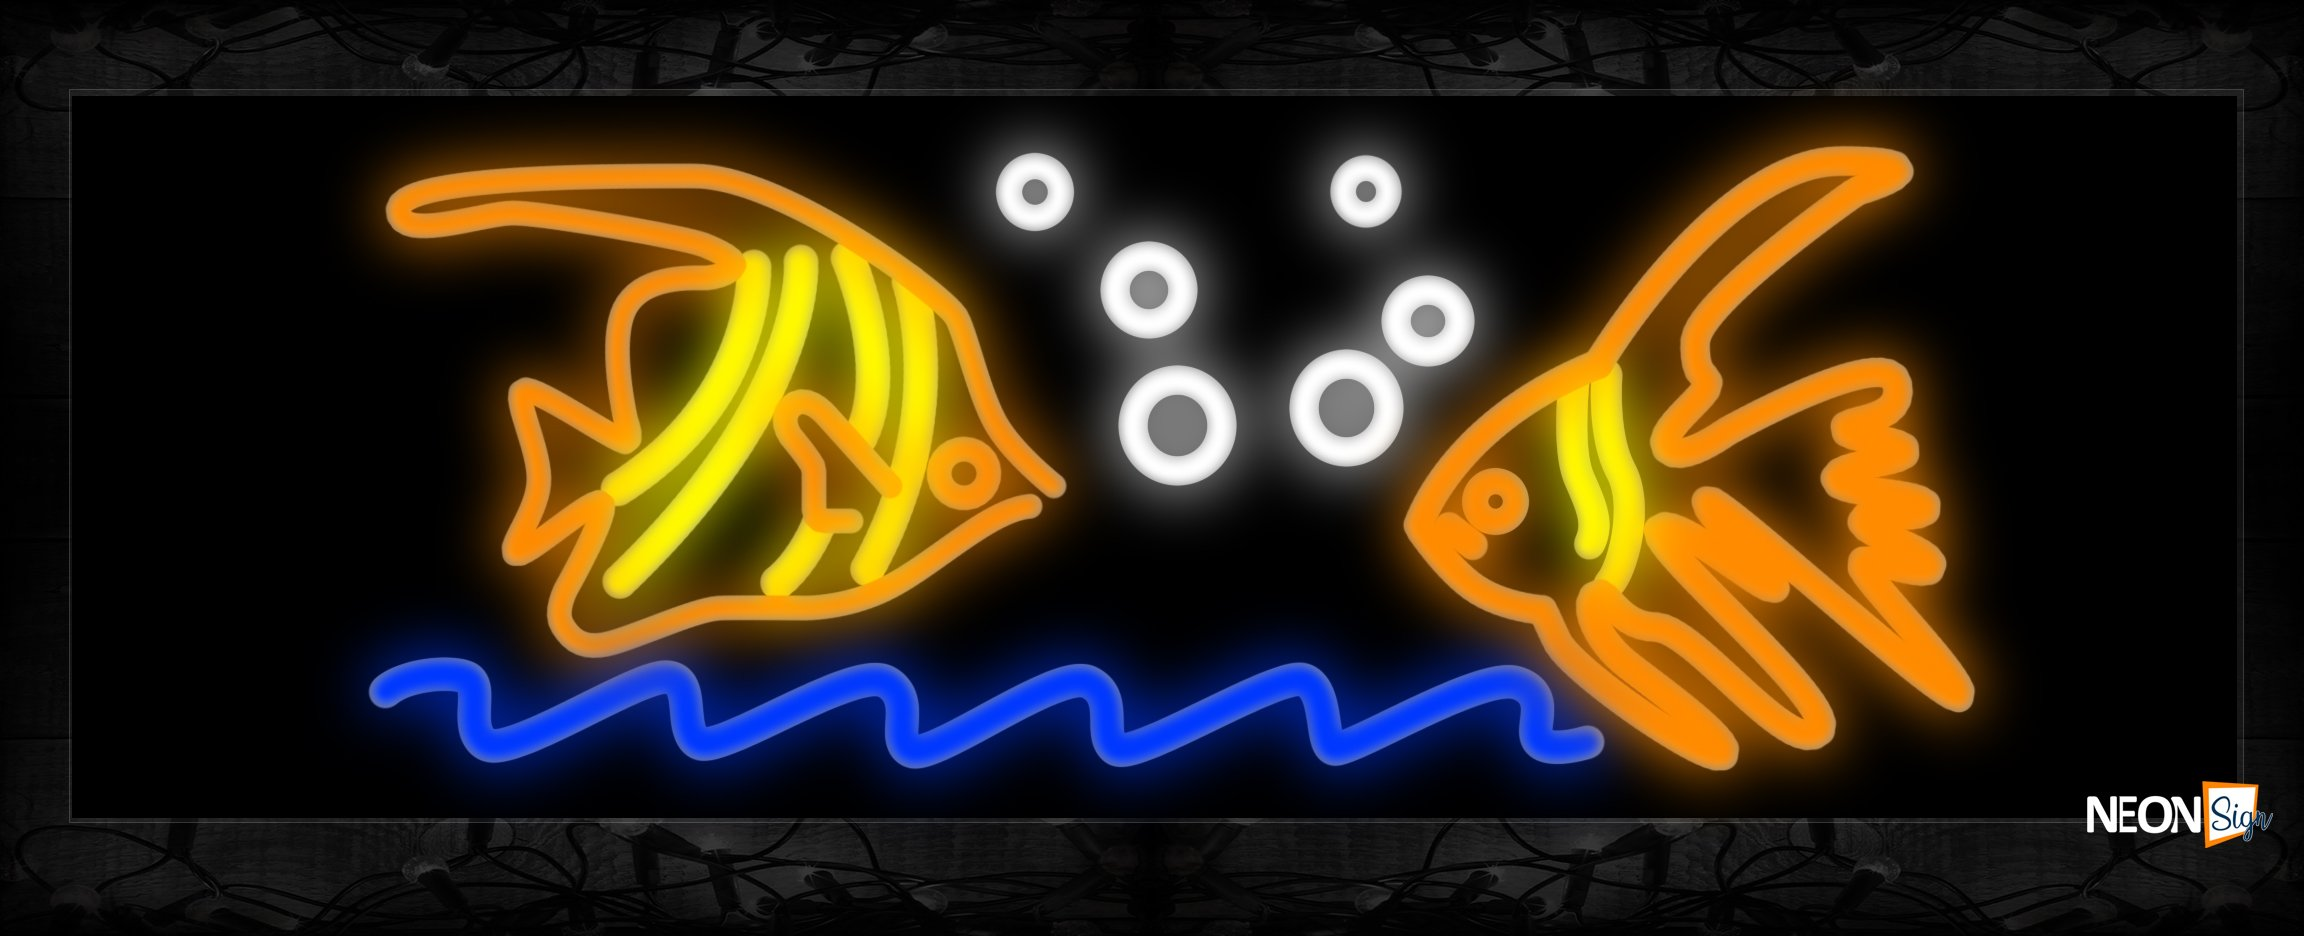 Image Of 2 Fish Neon Sign - NeonSign.com - photo#14